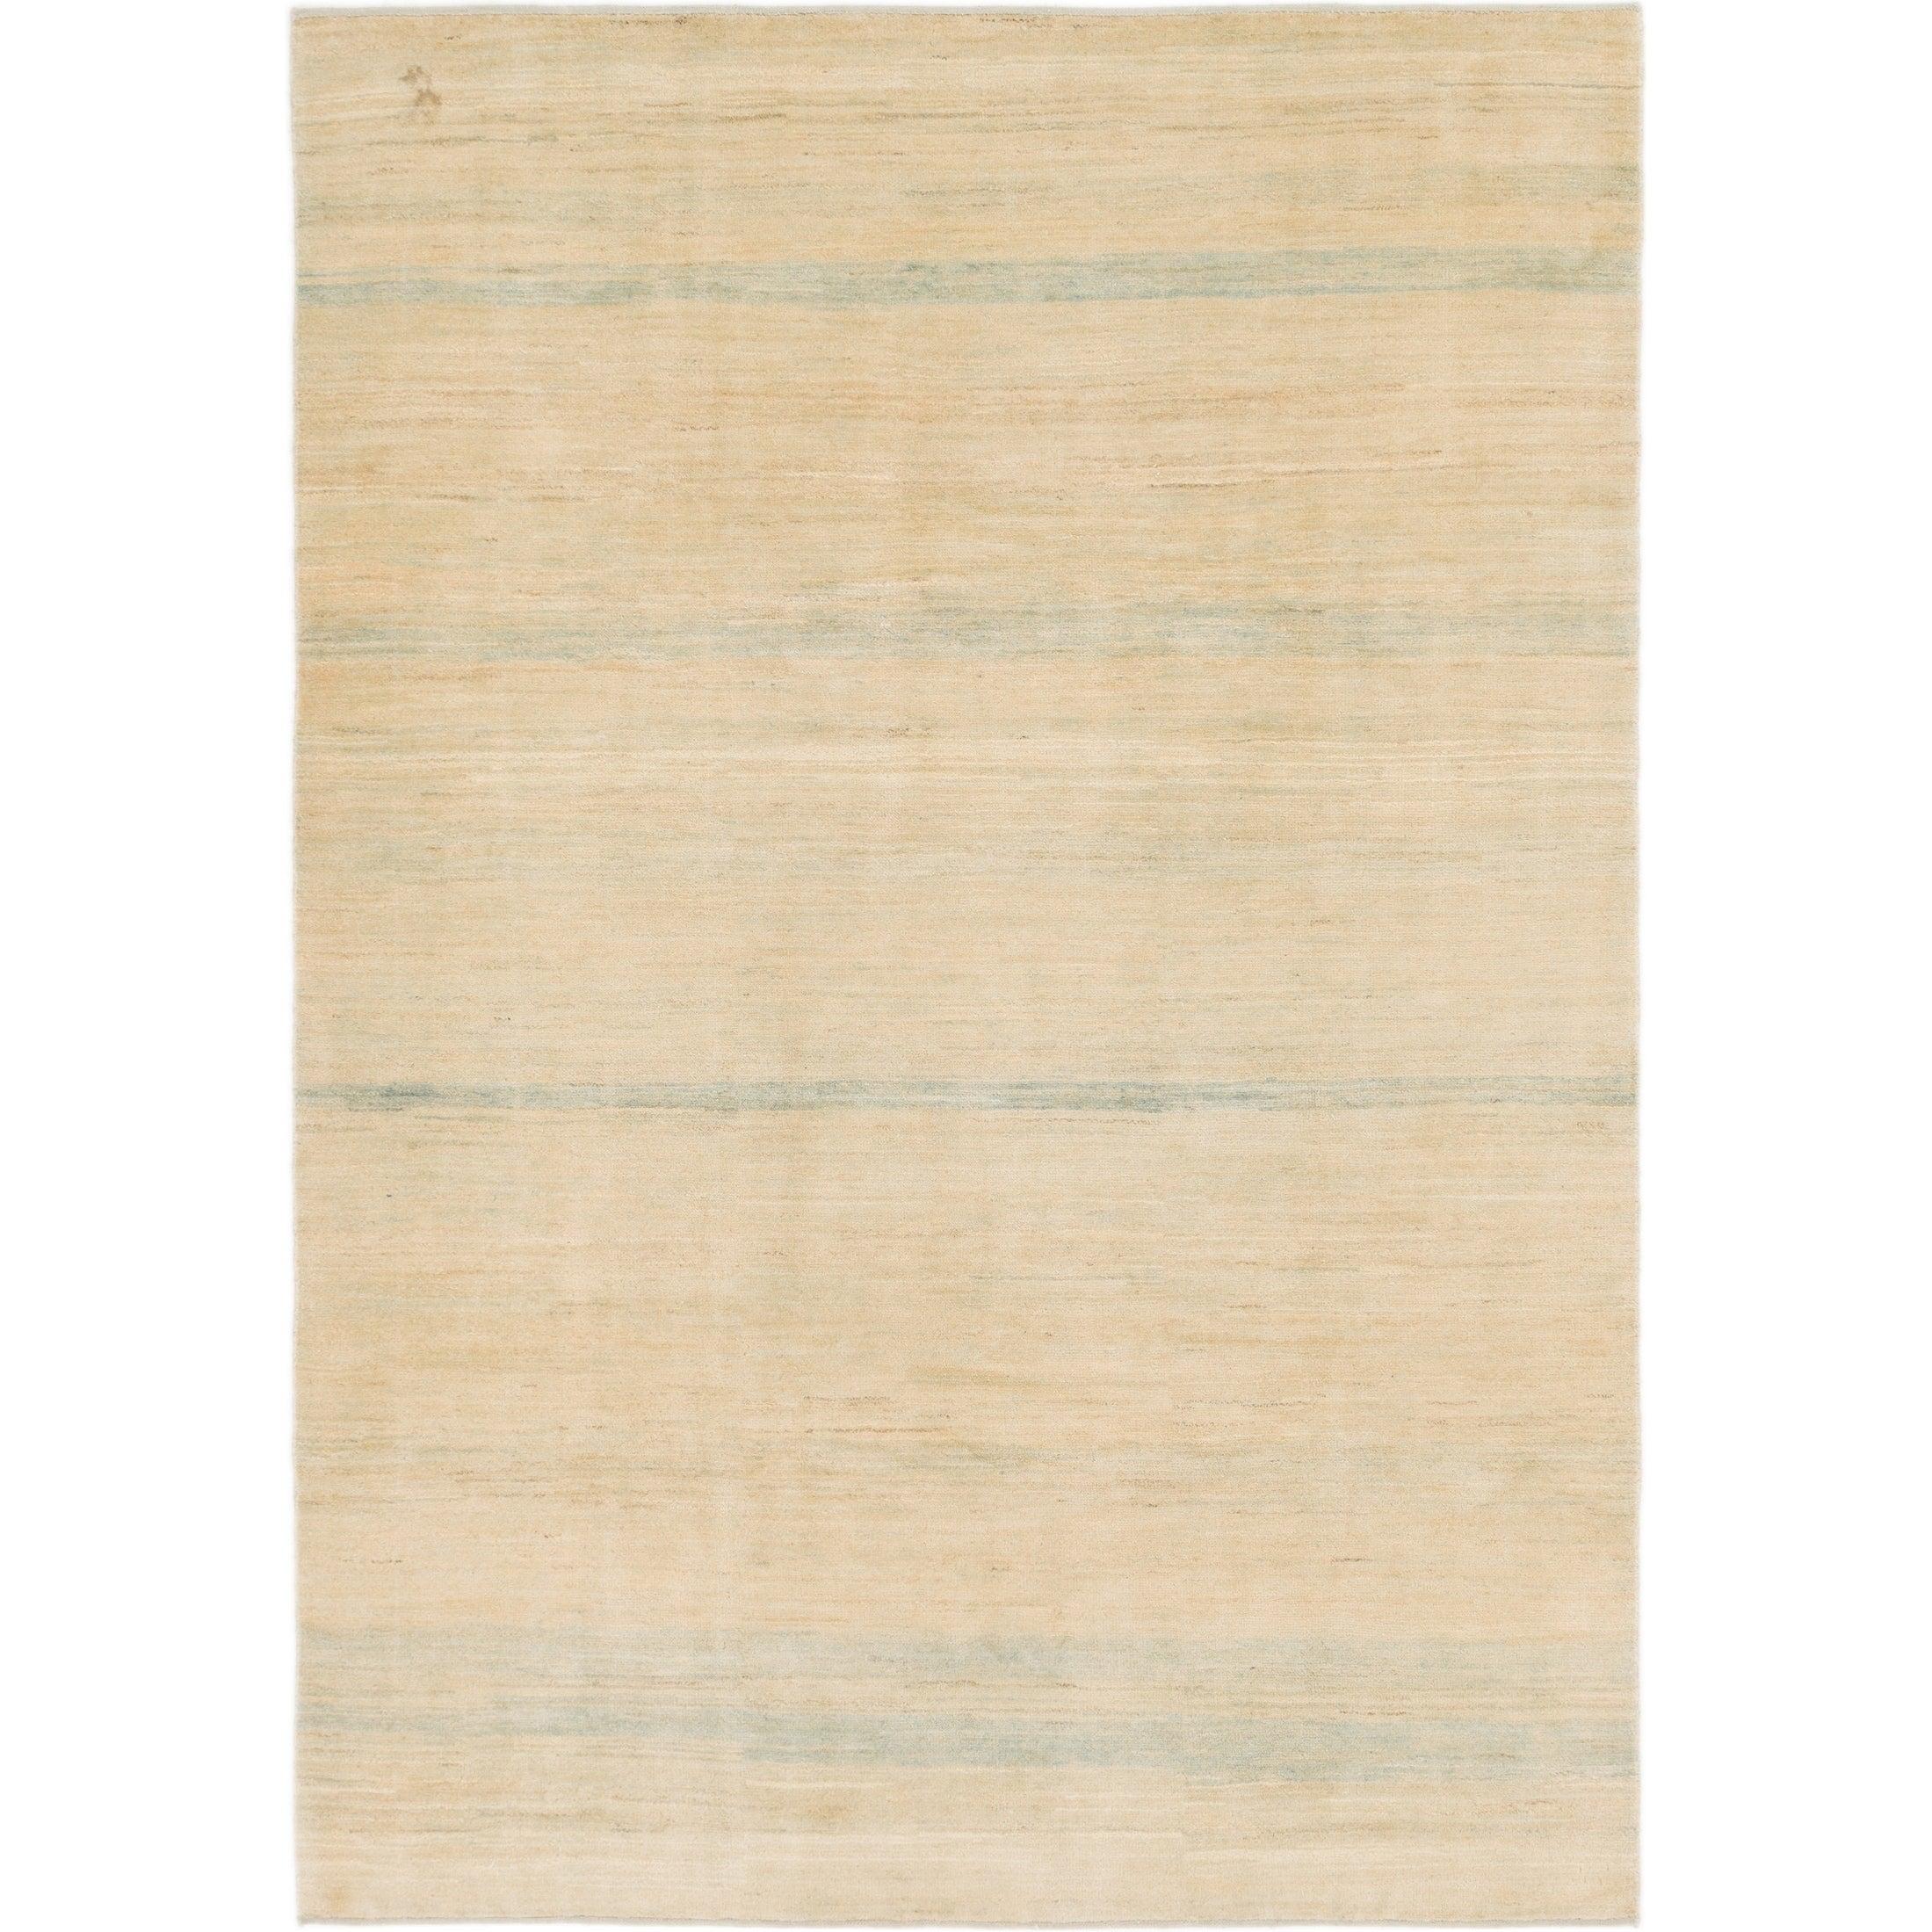 Hand Knotted Kashkuli Gabbeh Wool Area Rug - 6 7 x 9 5 (Cream - 6 7 x 9 5)